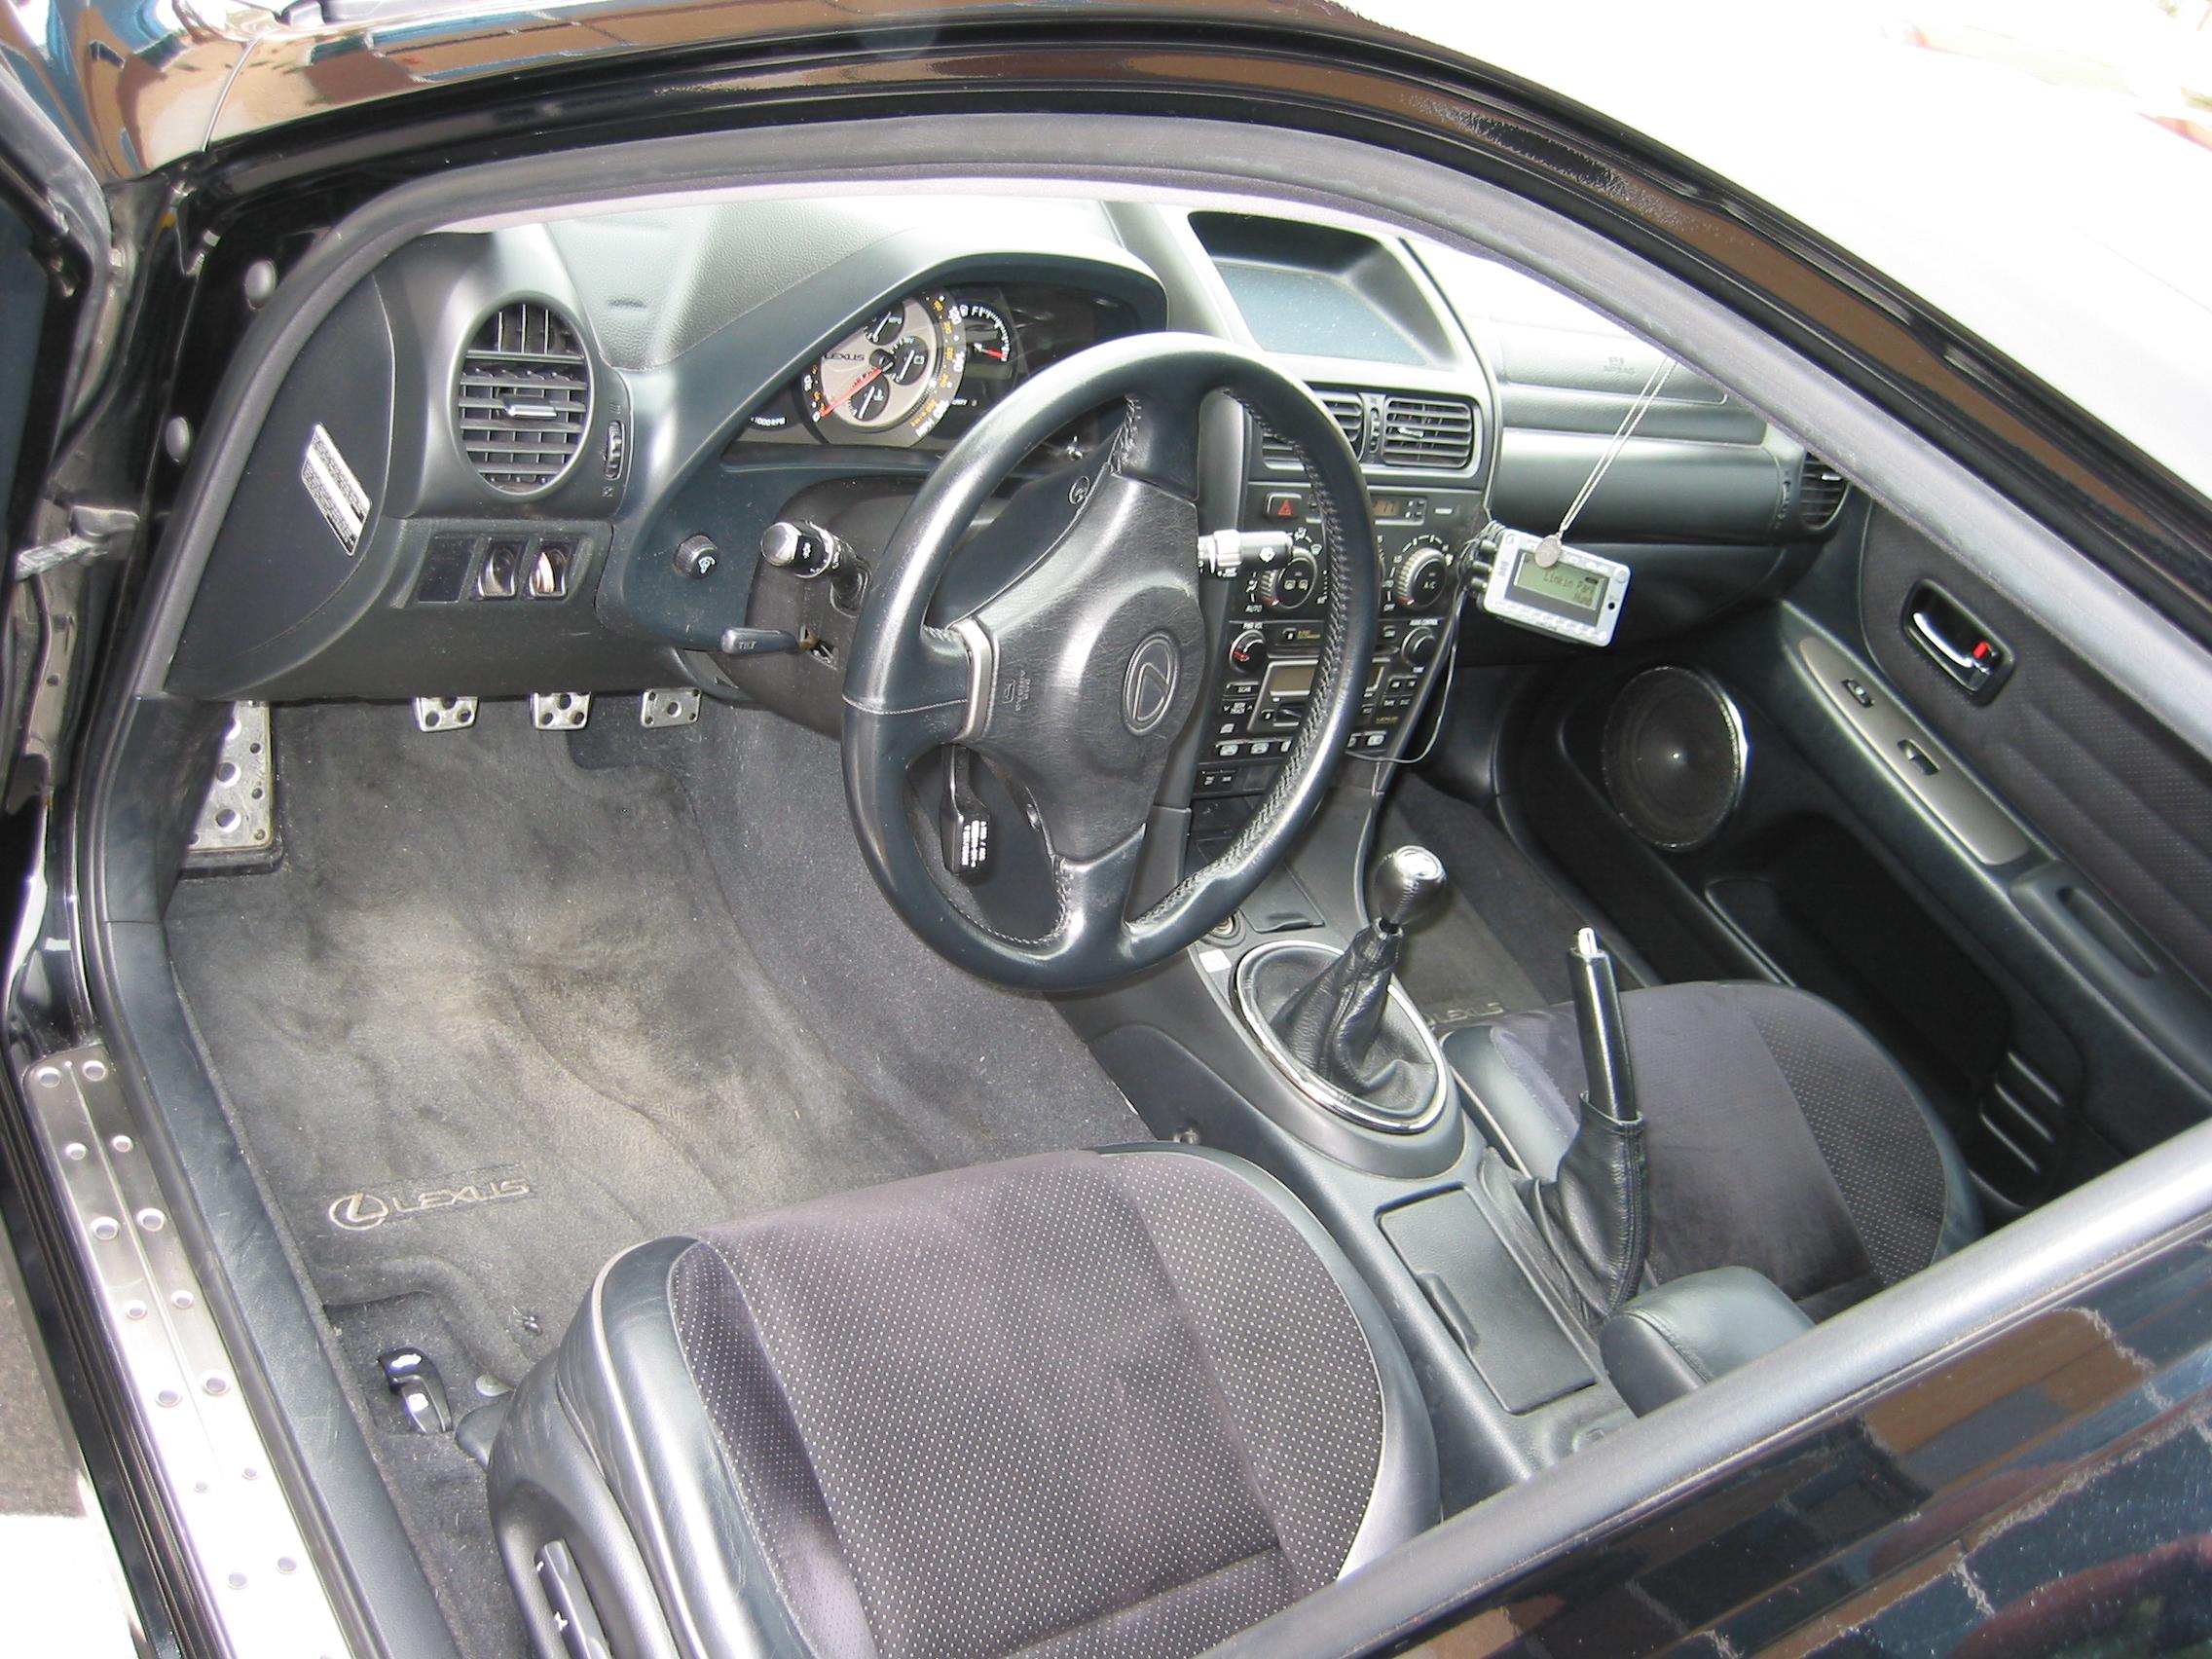 File:Lexus IS 300 interior 5-speed.jpg